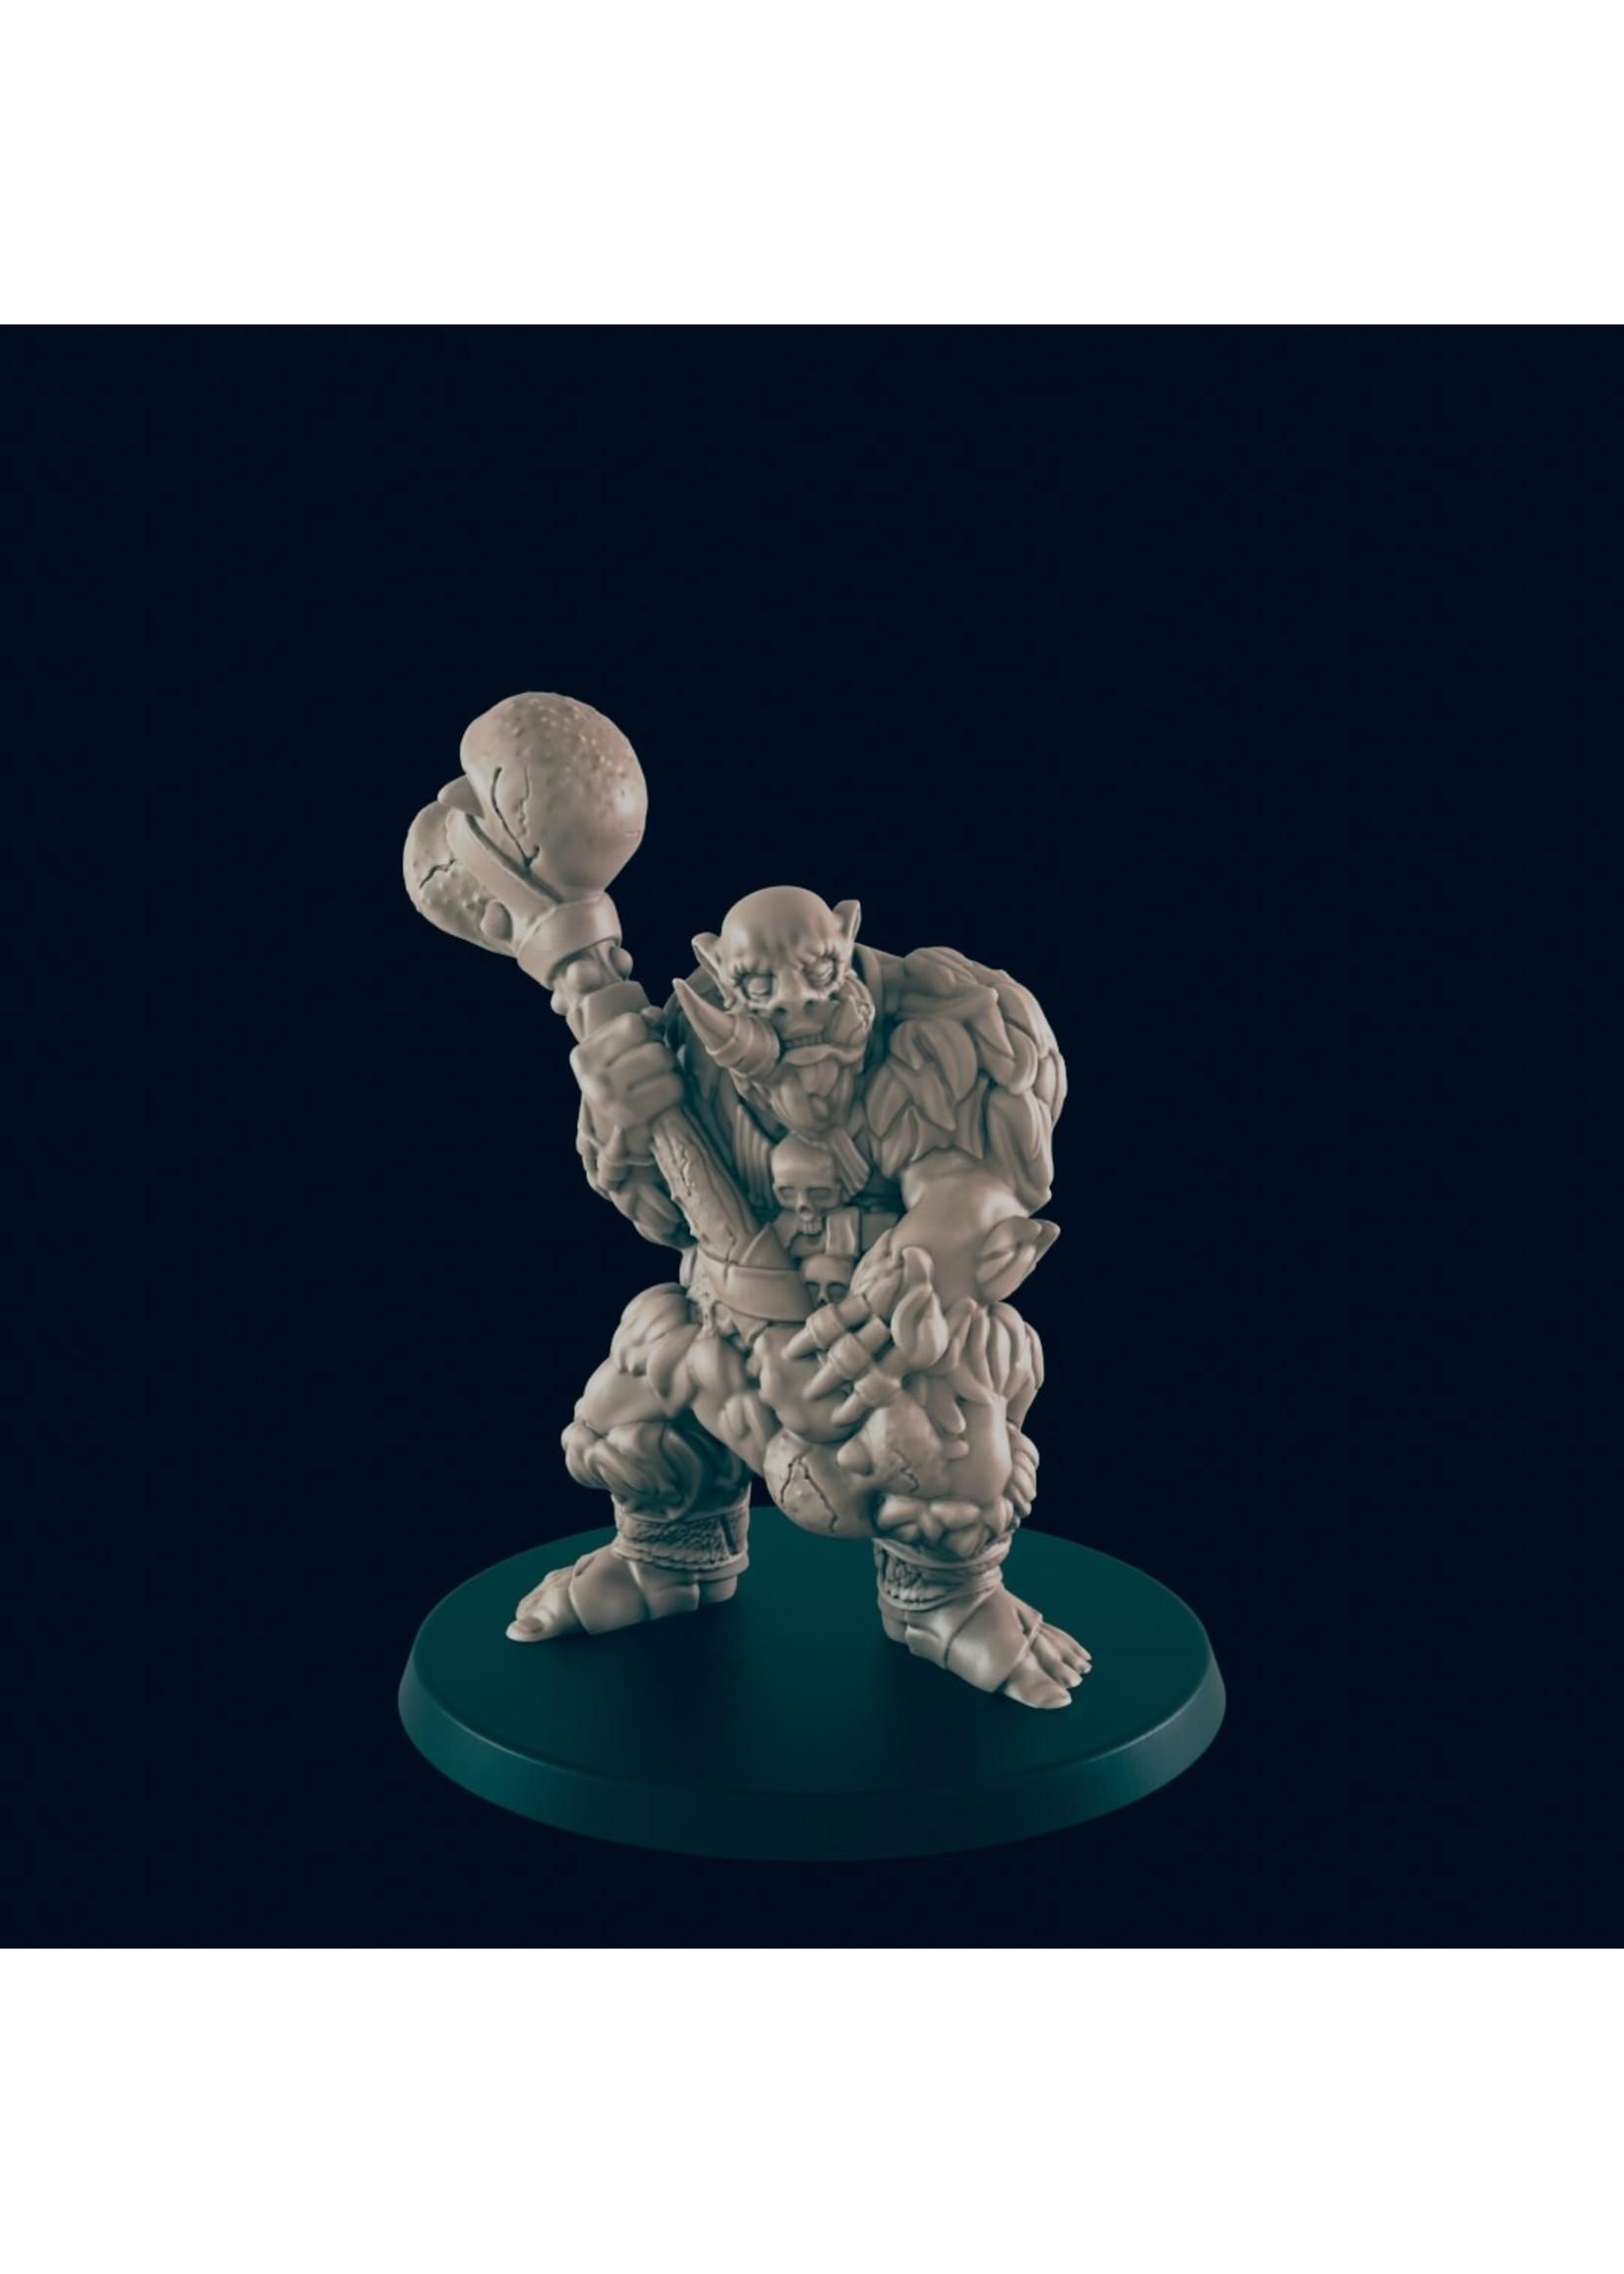 3D Printed Miniature - Troll A - Dungeons & Dragons - Beasts and Baddies KS